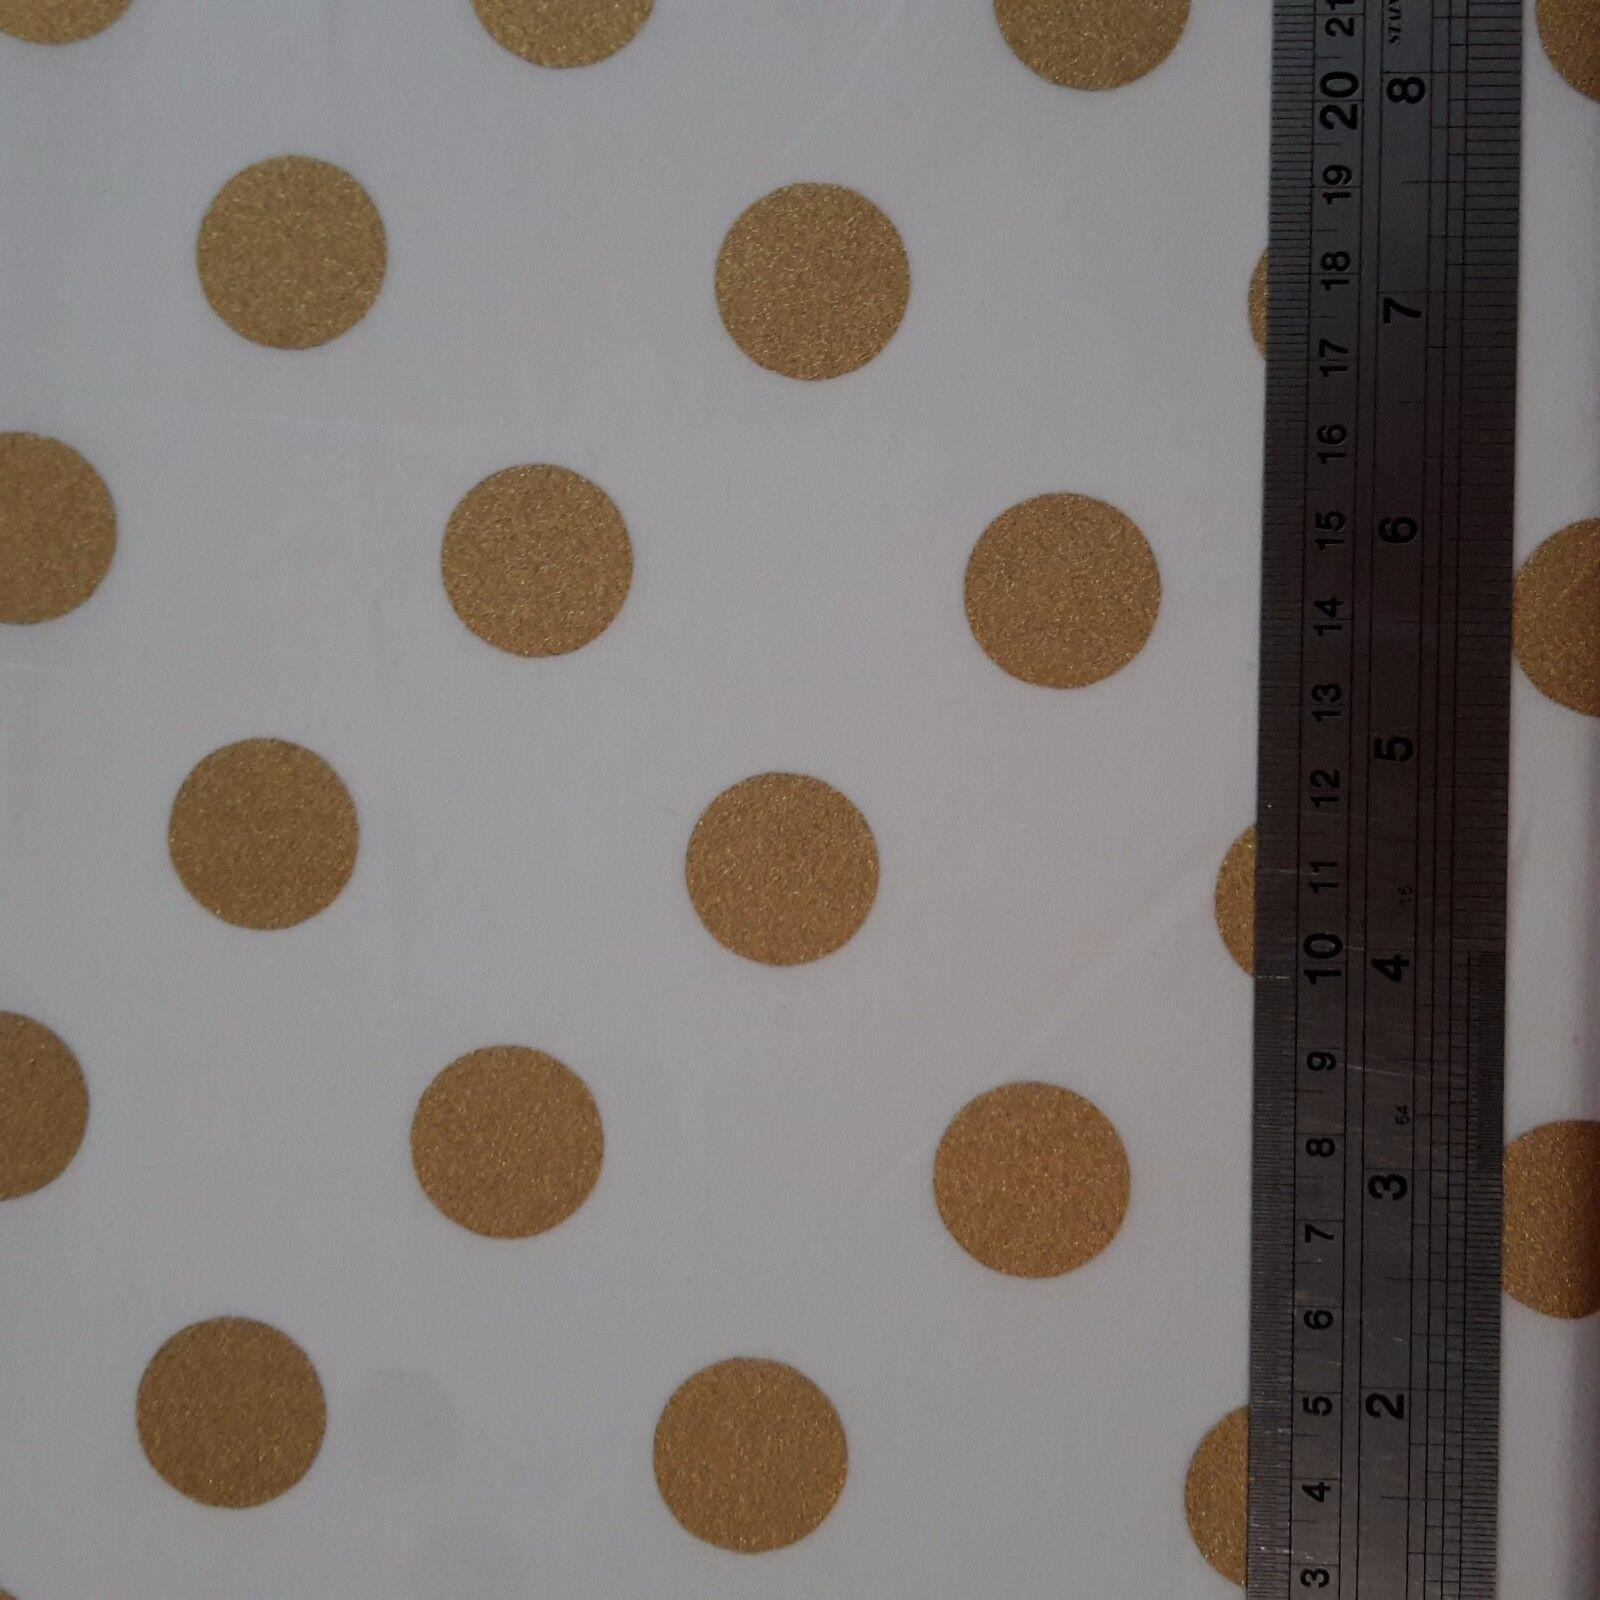 100/% cotton Fabric Stardust Flowers Natural Beauty Black//Gold Metallic